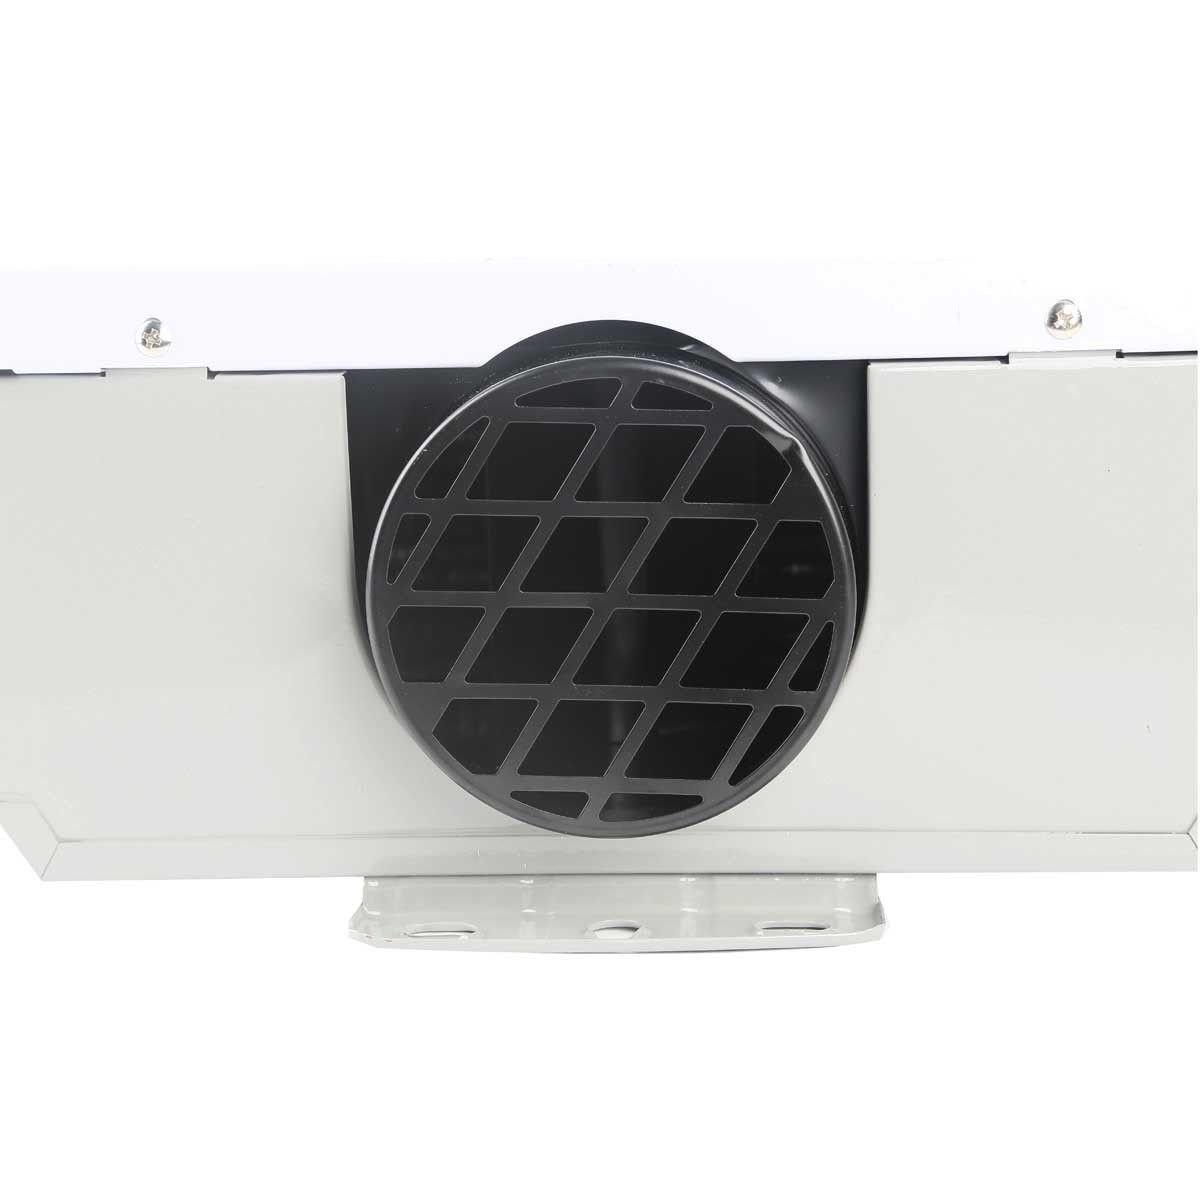 18l Tengchang 8l 12l 18l Lpg Gas Hot Water Heater Instant Boiler Digital Display Shower Home Tankless Water Heaters